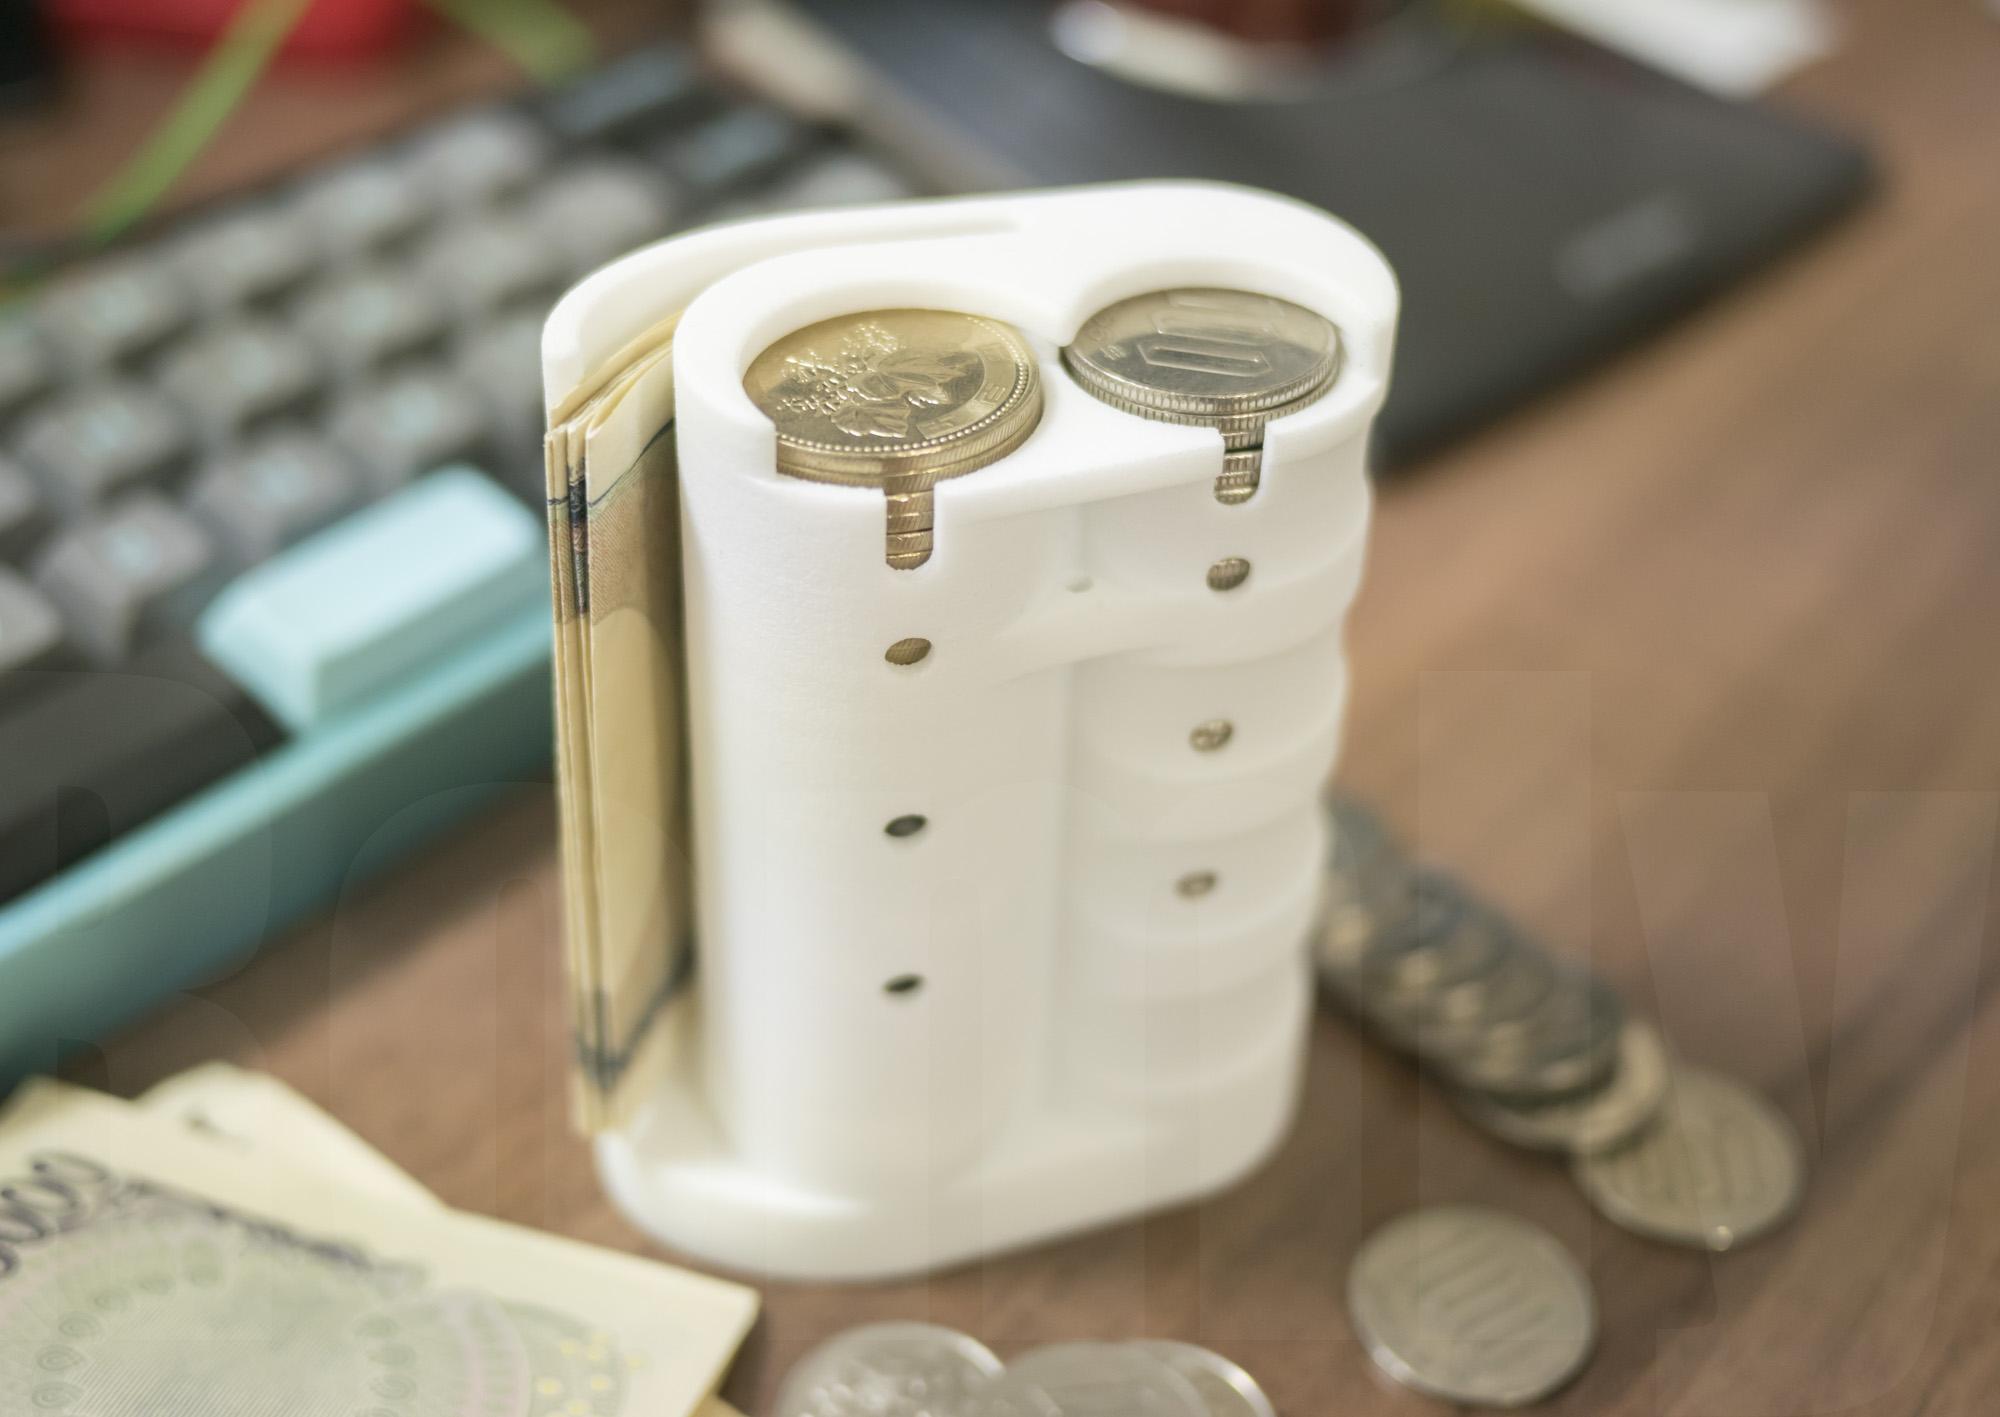 Dojin Coin Cylinder - Usecase